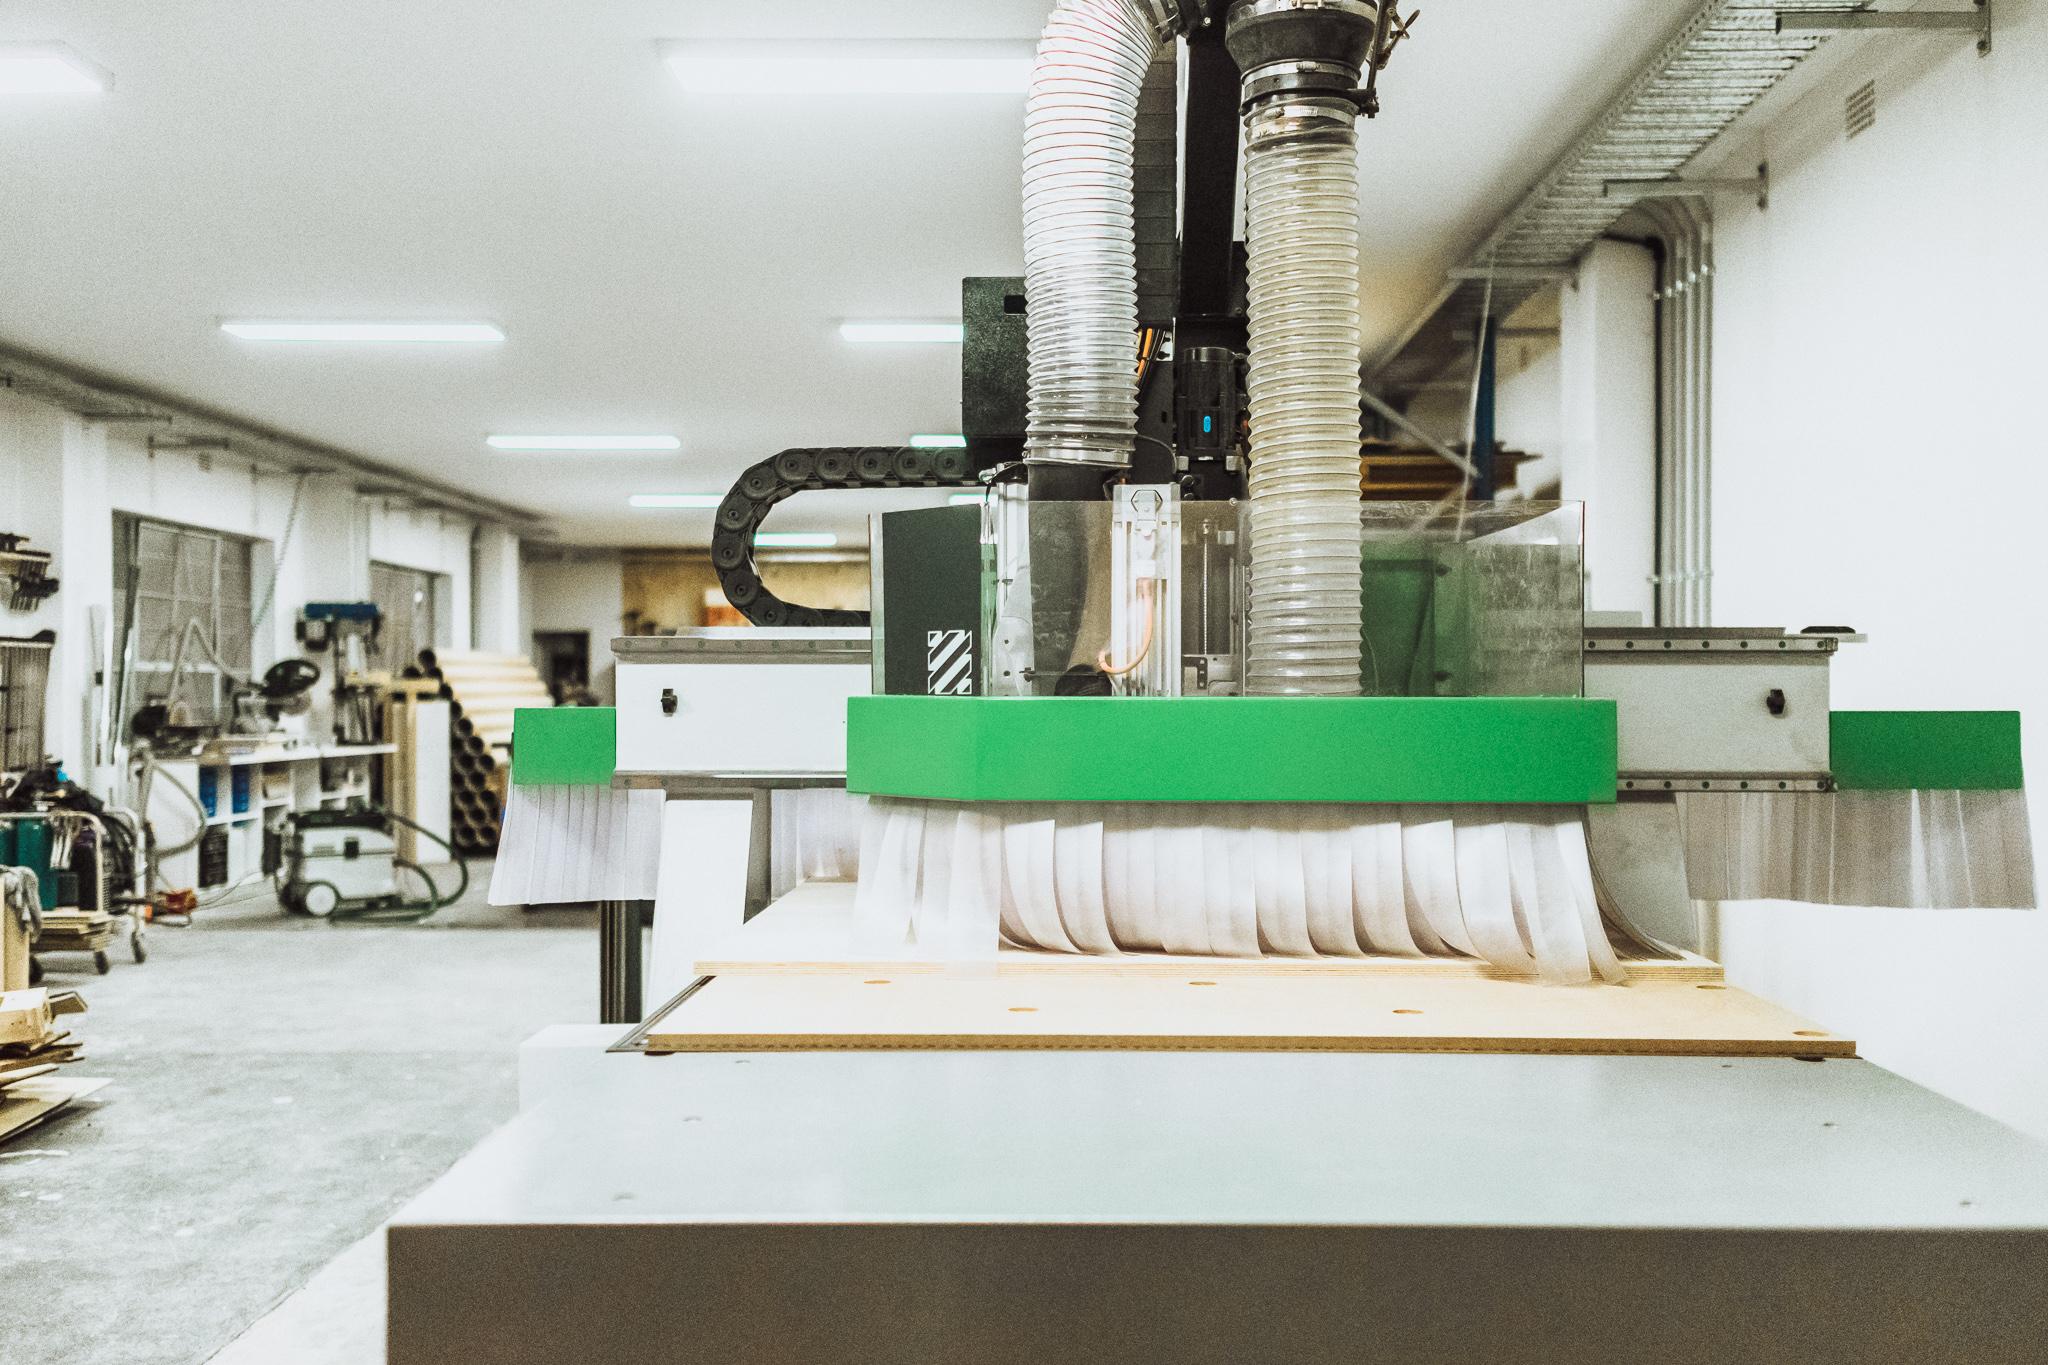 MANUFACTURE opt1 - SoWatt-CNC-Design-Manufacture-Studio-Workshop-Sydney.jpg